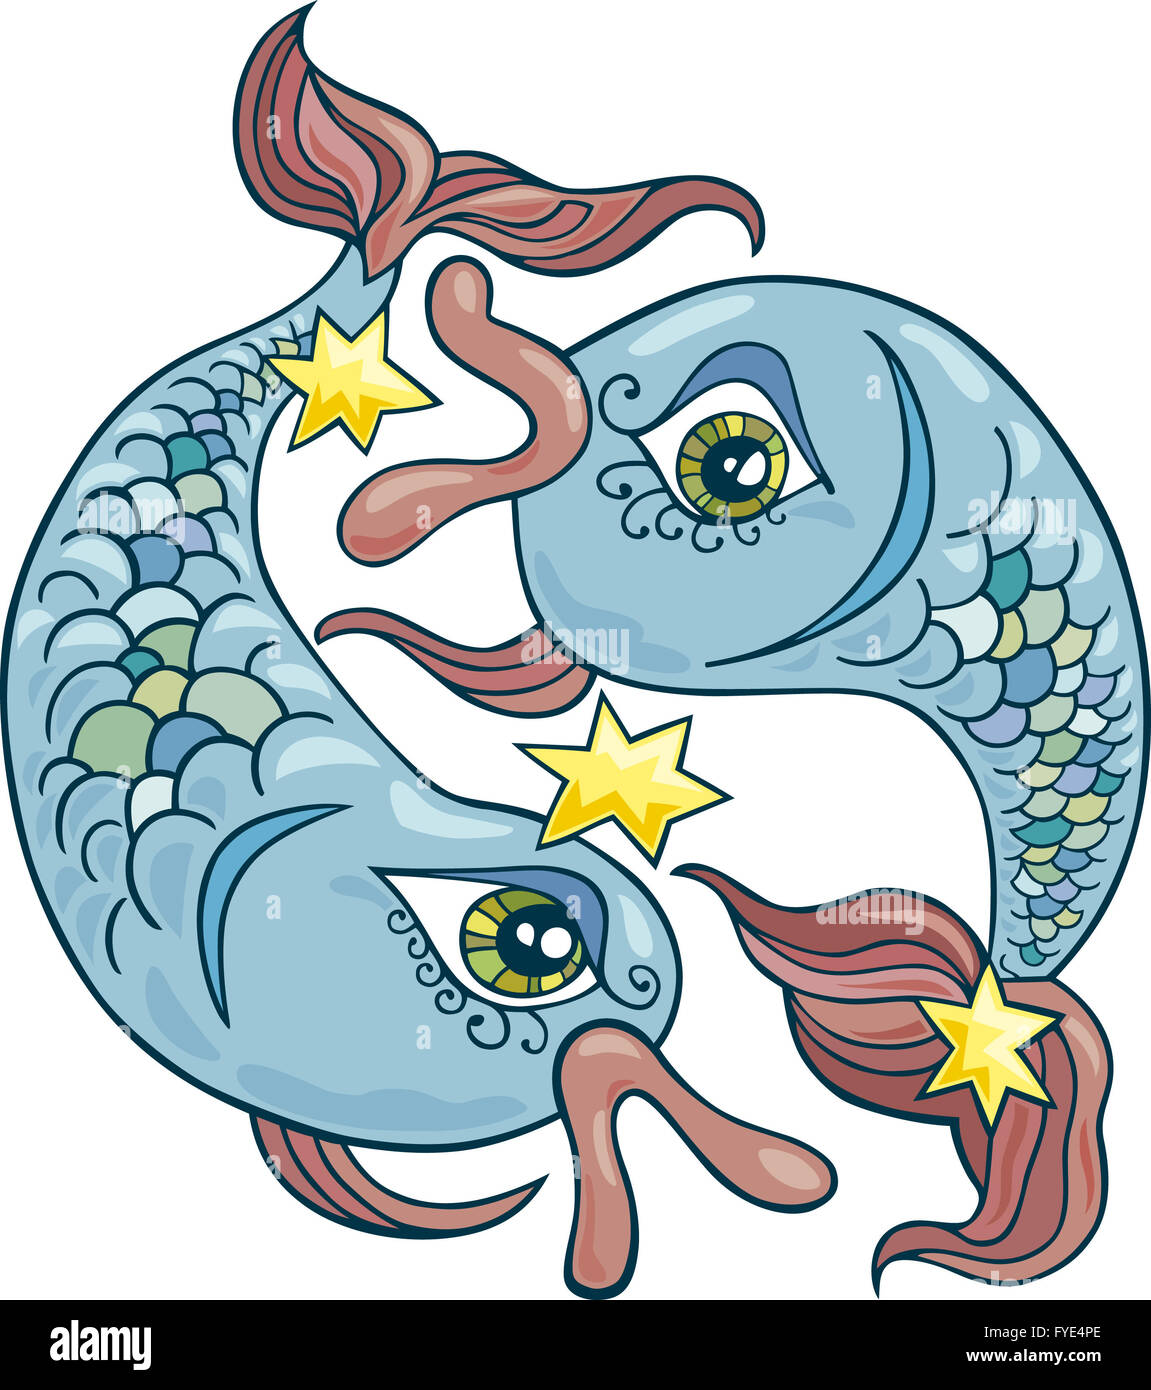 Zodiac Pisces Sign Stock Photo Royalty Free Image 102958646 Alamy